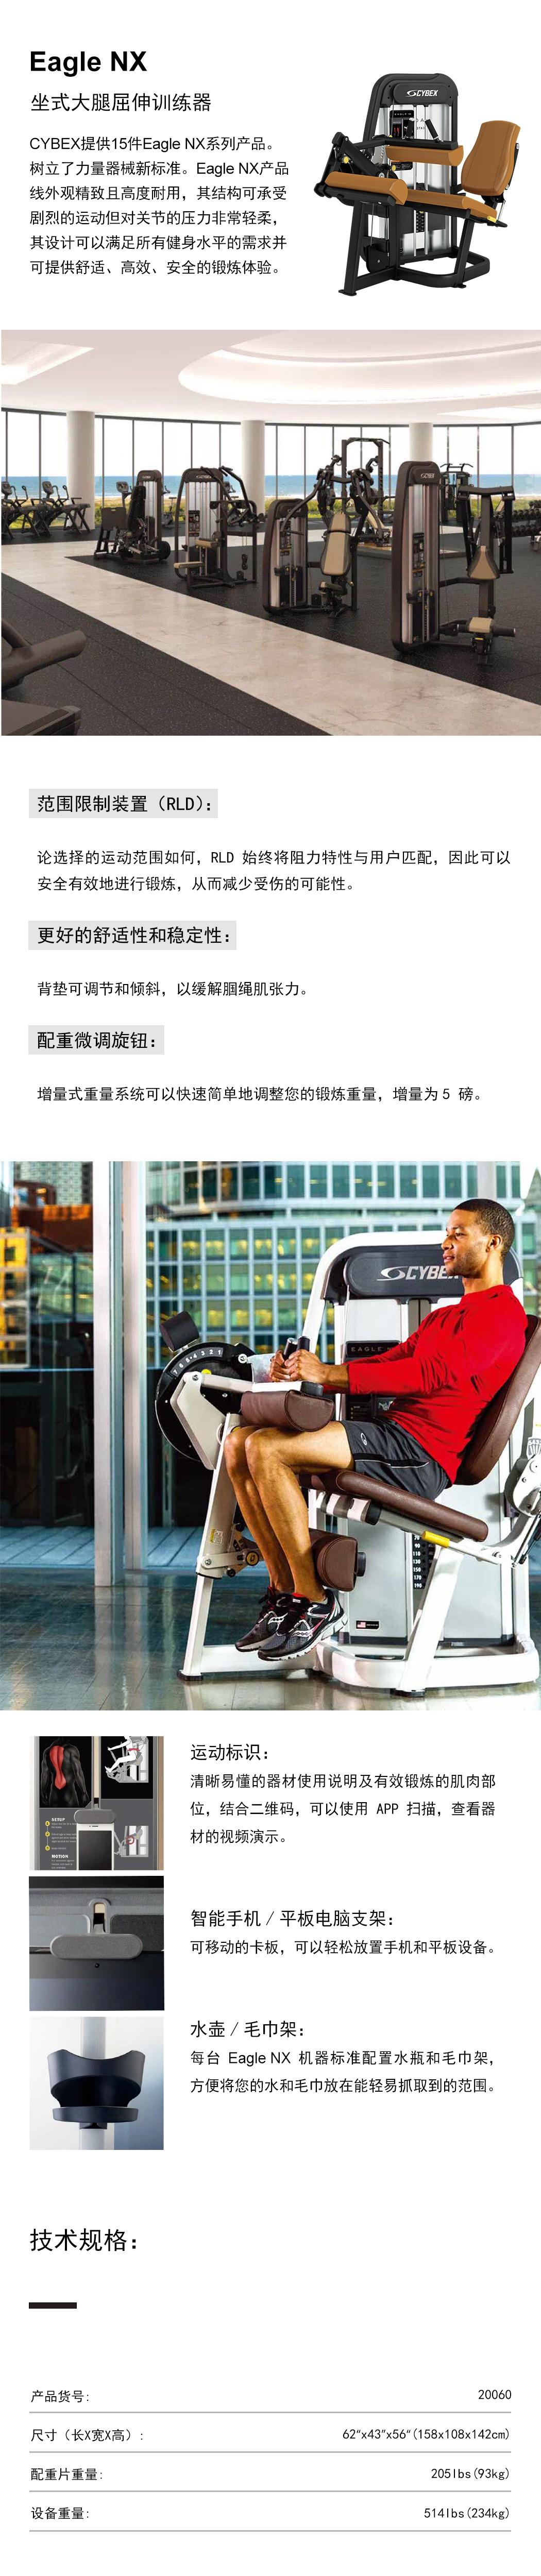 cybex-坐式大腿屈伸训练器.jpg